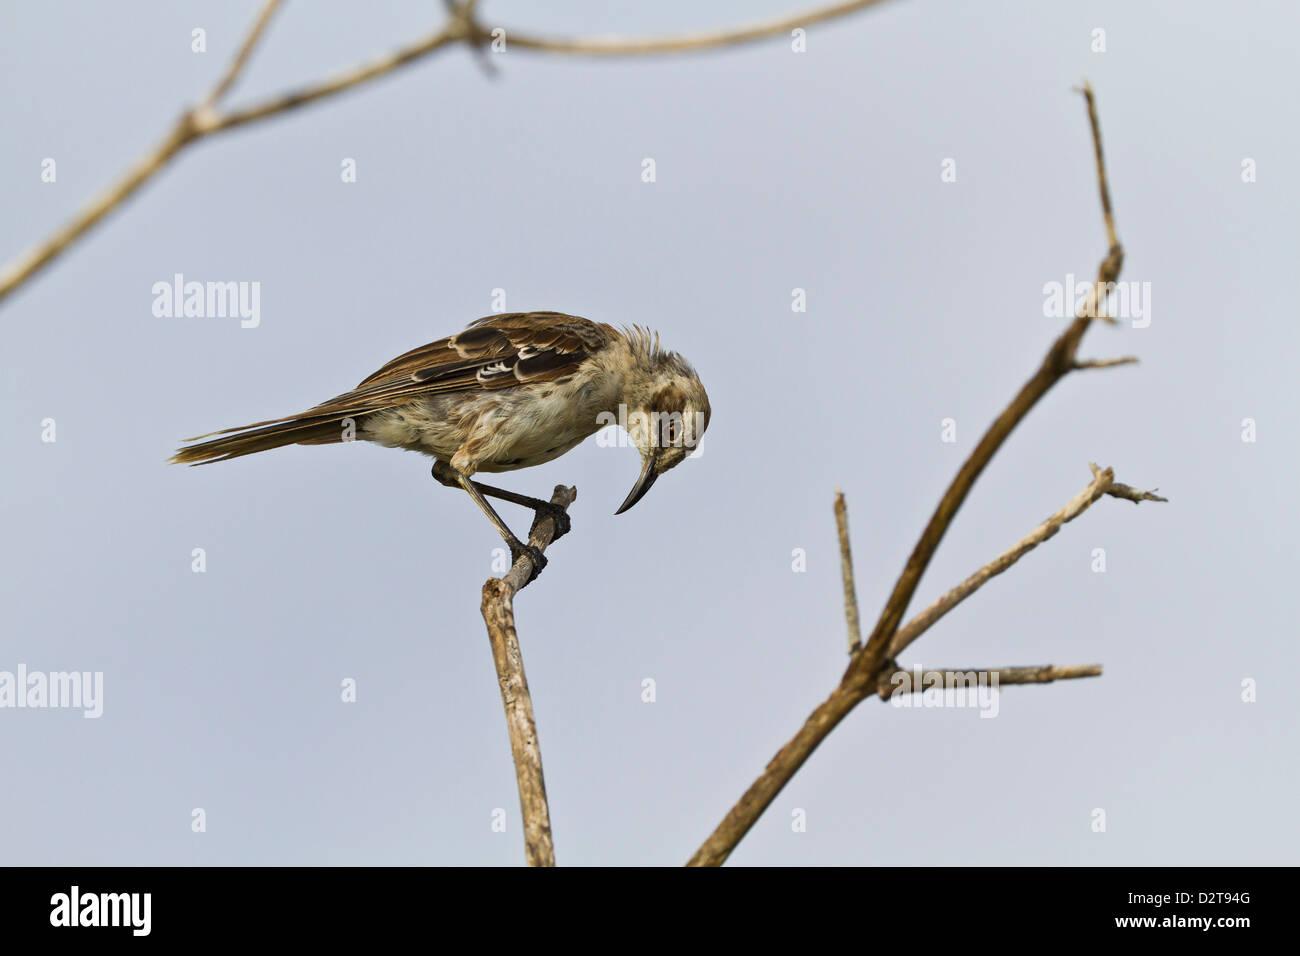 Adult San Cristobal mockingbird, Cerro Bruja, San Cristobal Island, Galapagos Islands, Ecuador Stock Photo